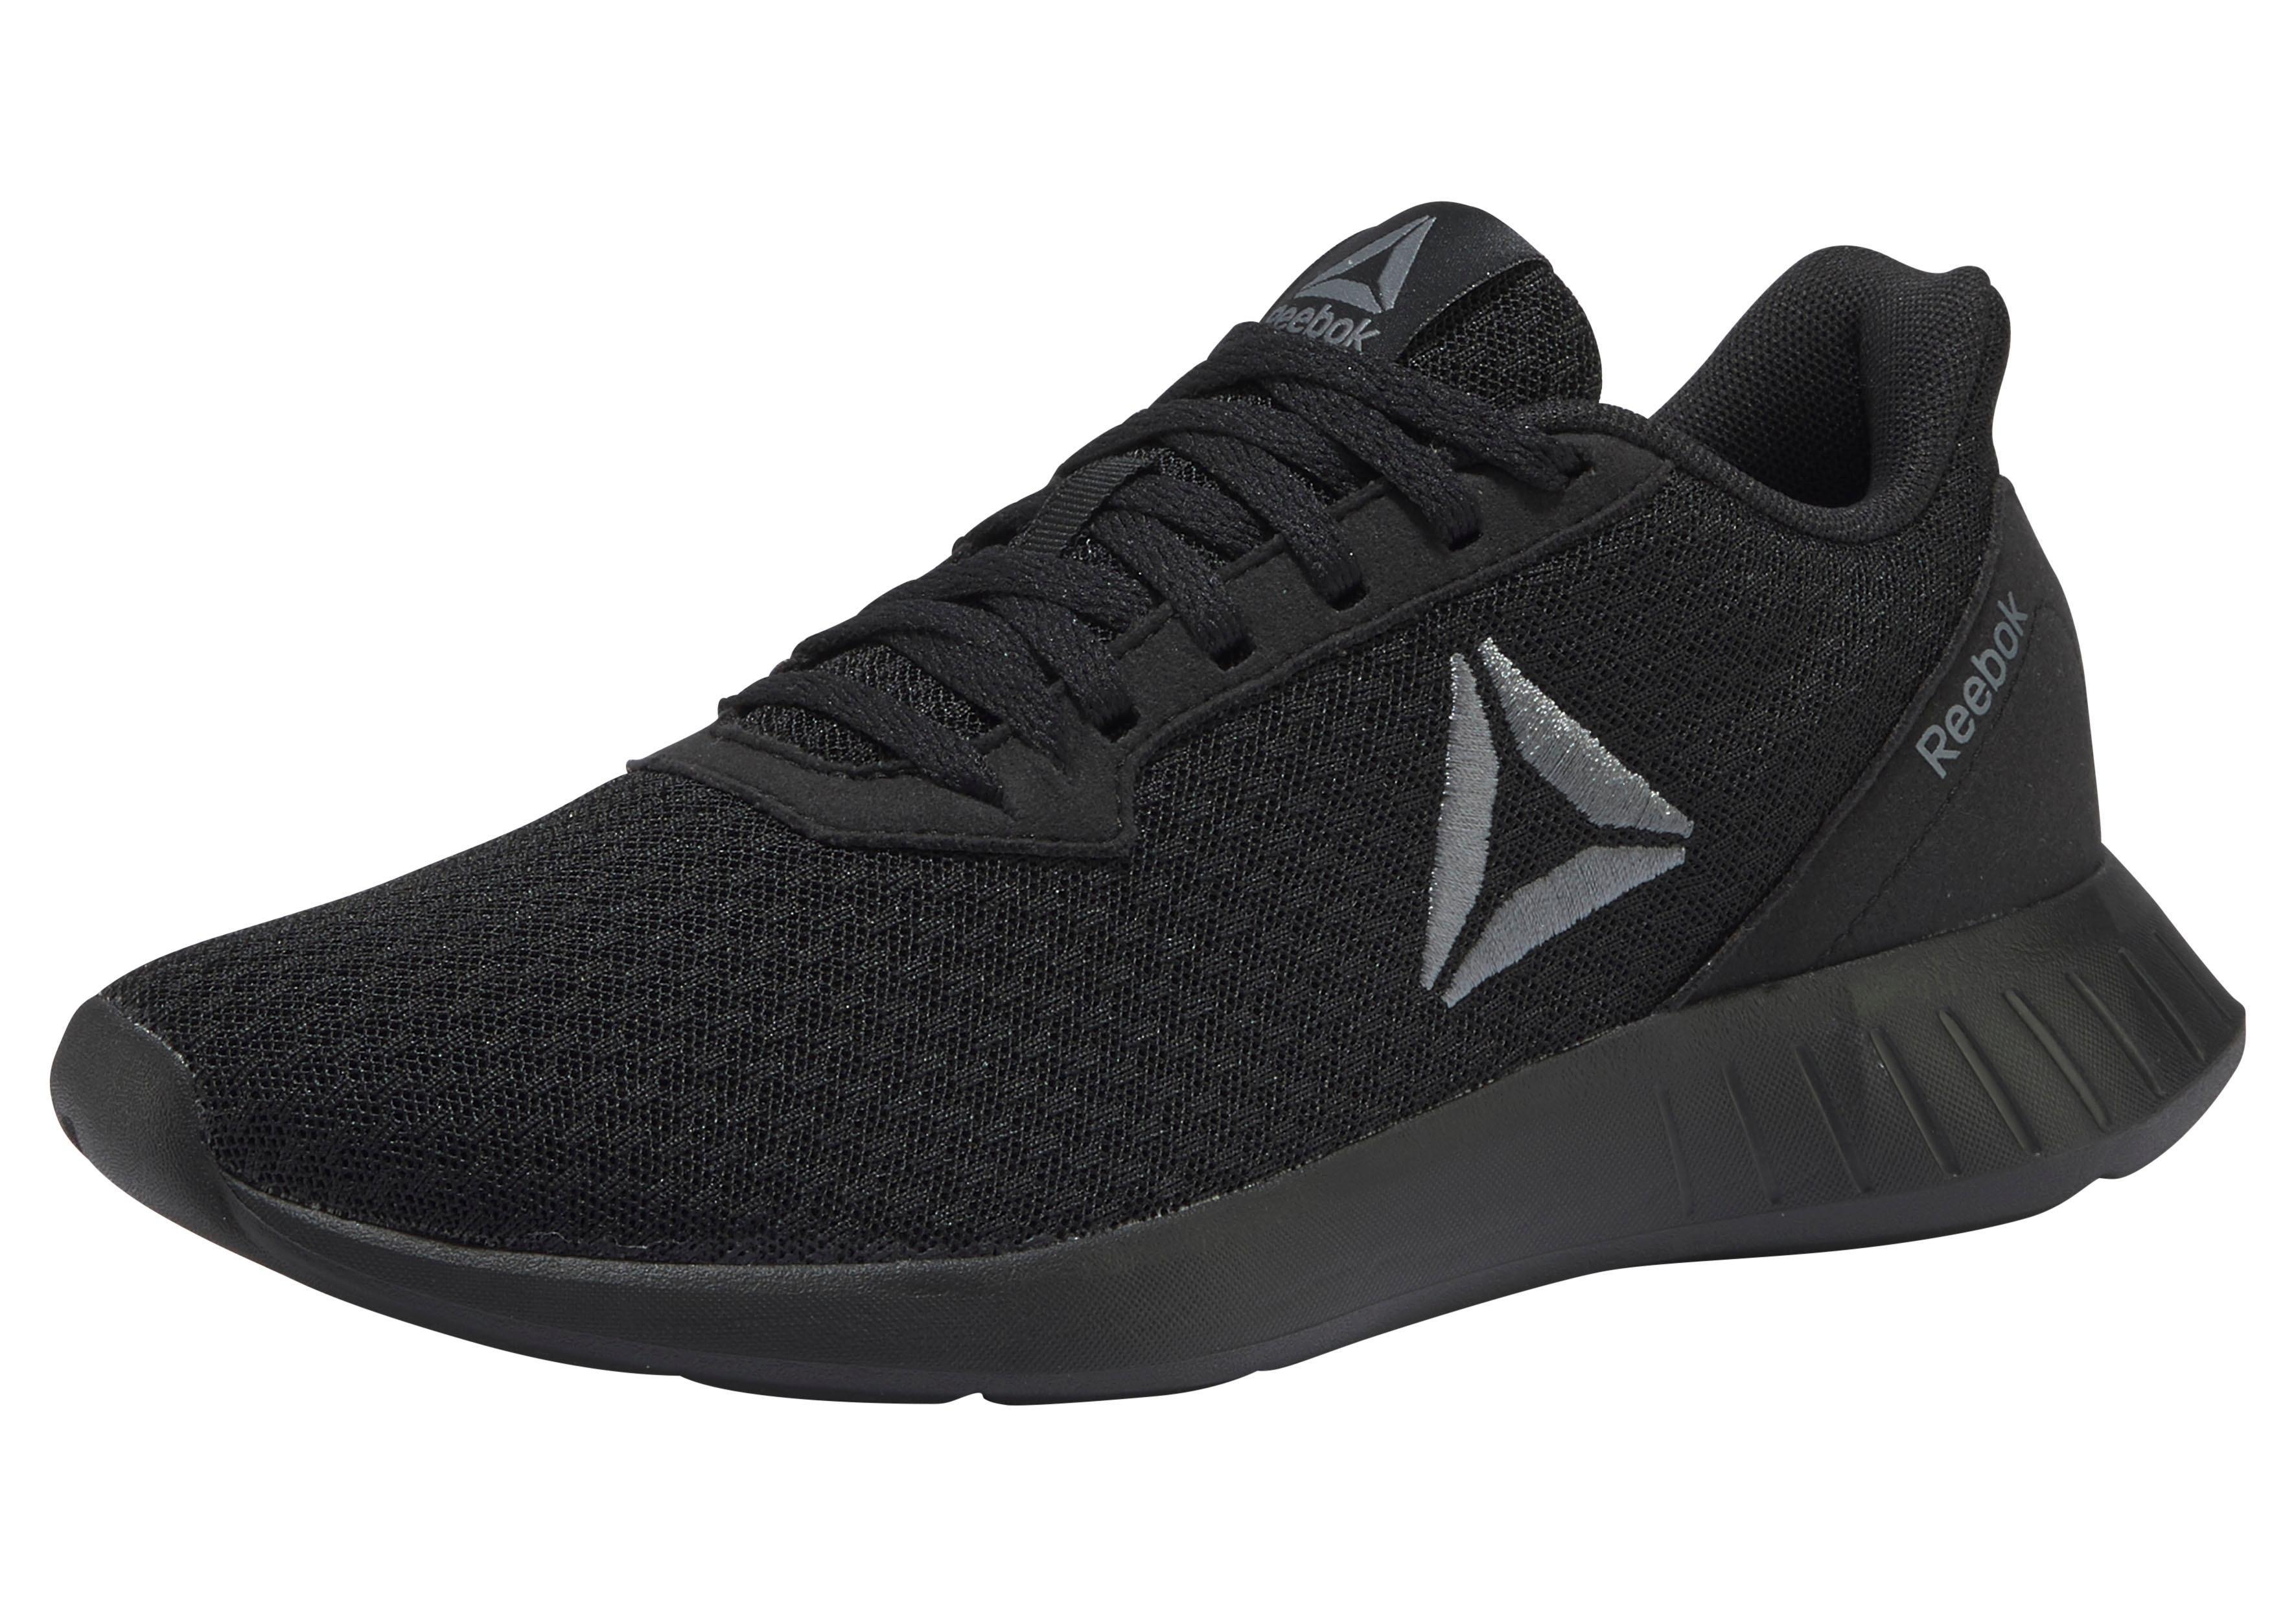 cc8b17fff0e ... Reebok fitnessschoenen »3D Fusion TR W«, Reebok fitnessschoenen  »FLEXAGON FIT W«, Reebok runningschoenen »Trilux Run«